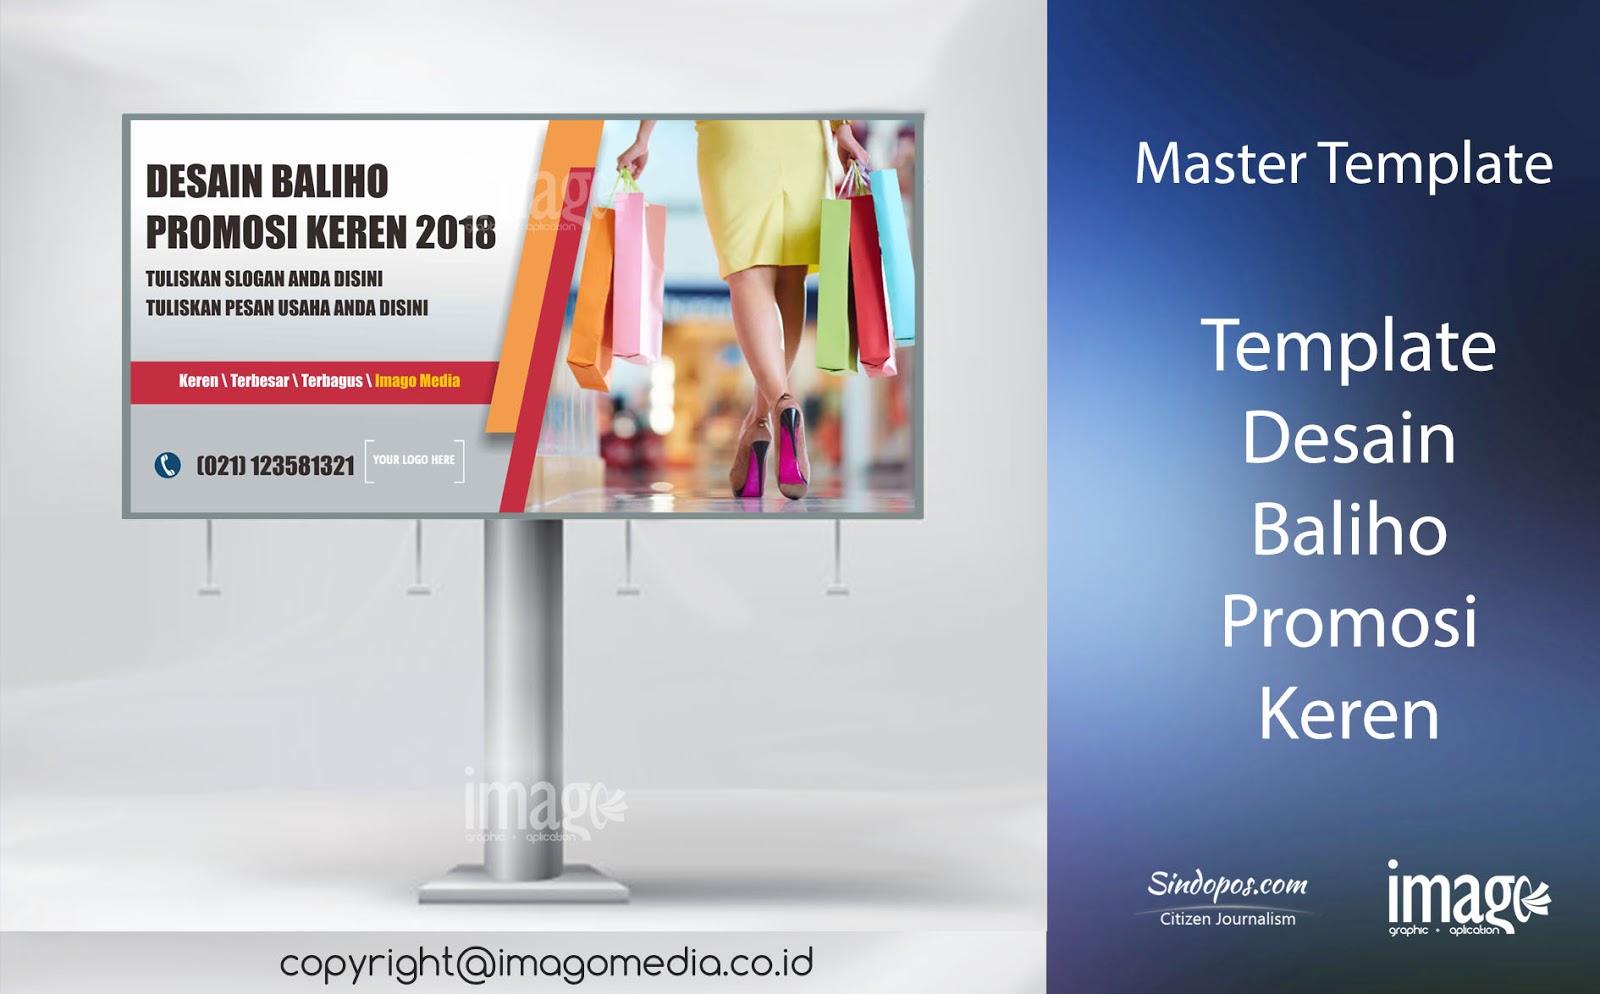 Contoh Desain Baliho Promosi Toko Online Keren Imago Media Home Of Creativity